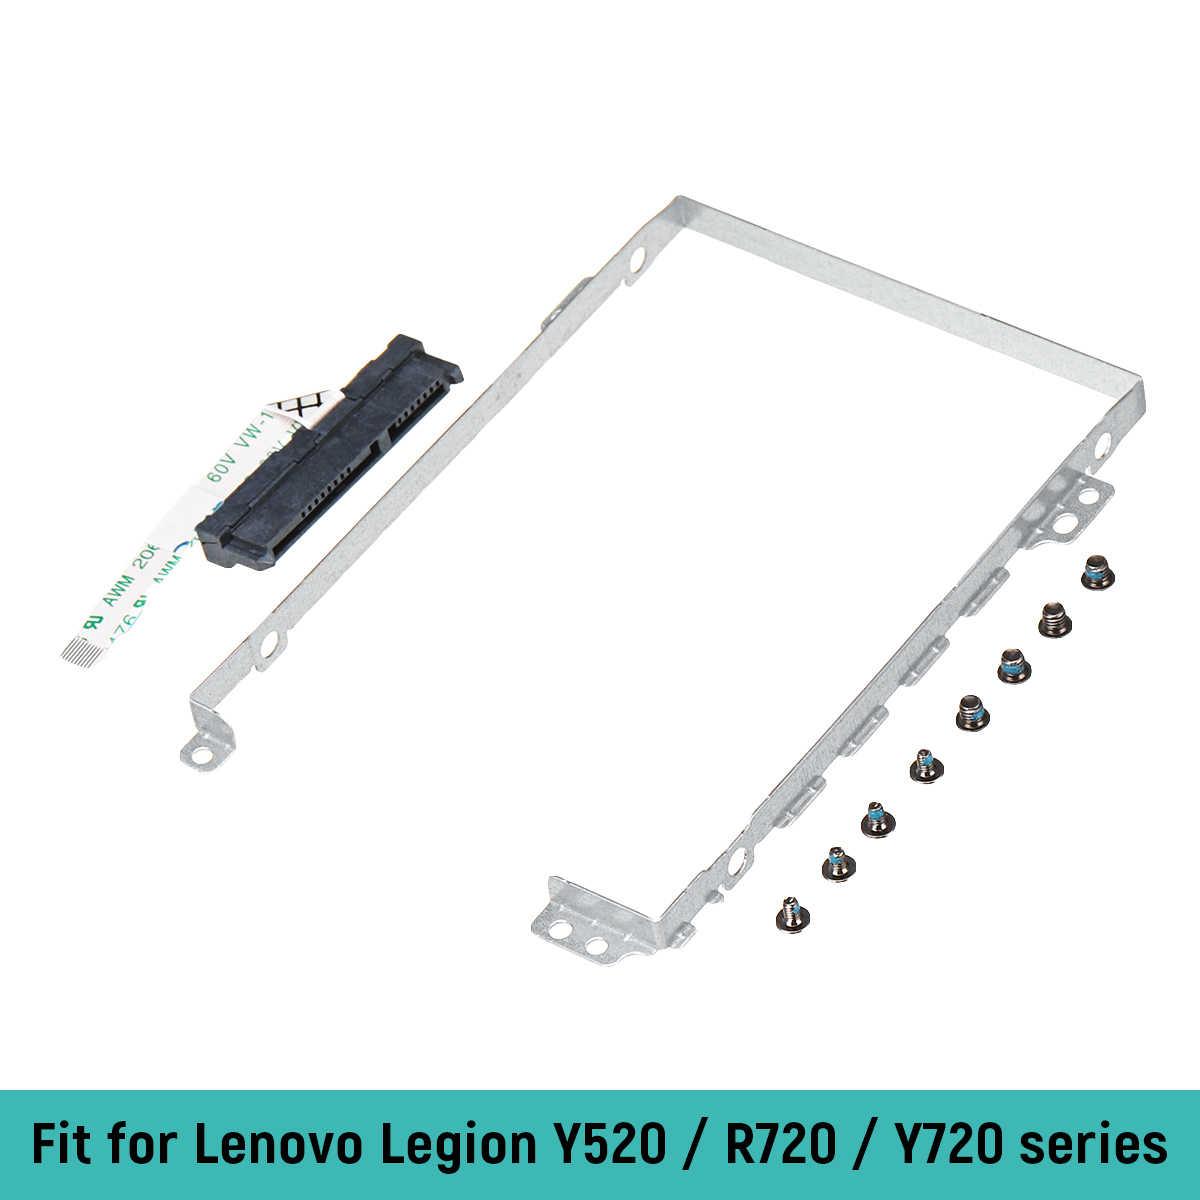 New HDD caddy For Lenovo Legion Y720 Y720-15IKB Hard Drive holder Bracket +  Hard Drive HDD Connector Cable + screws